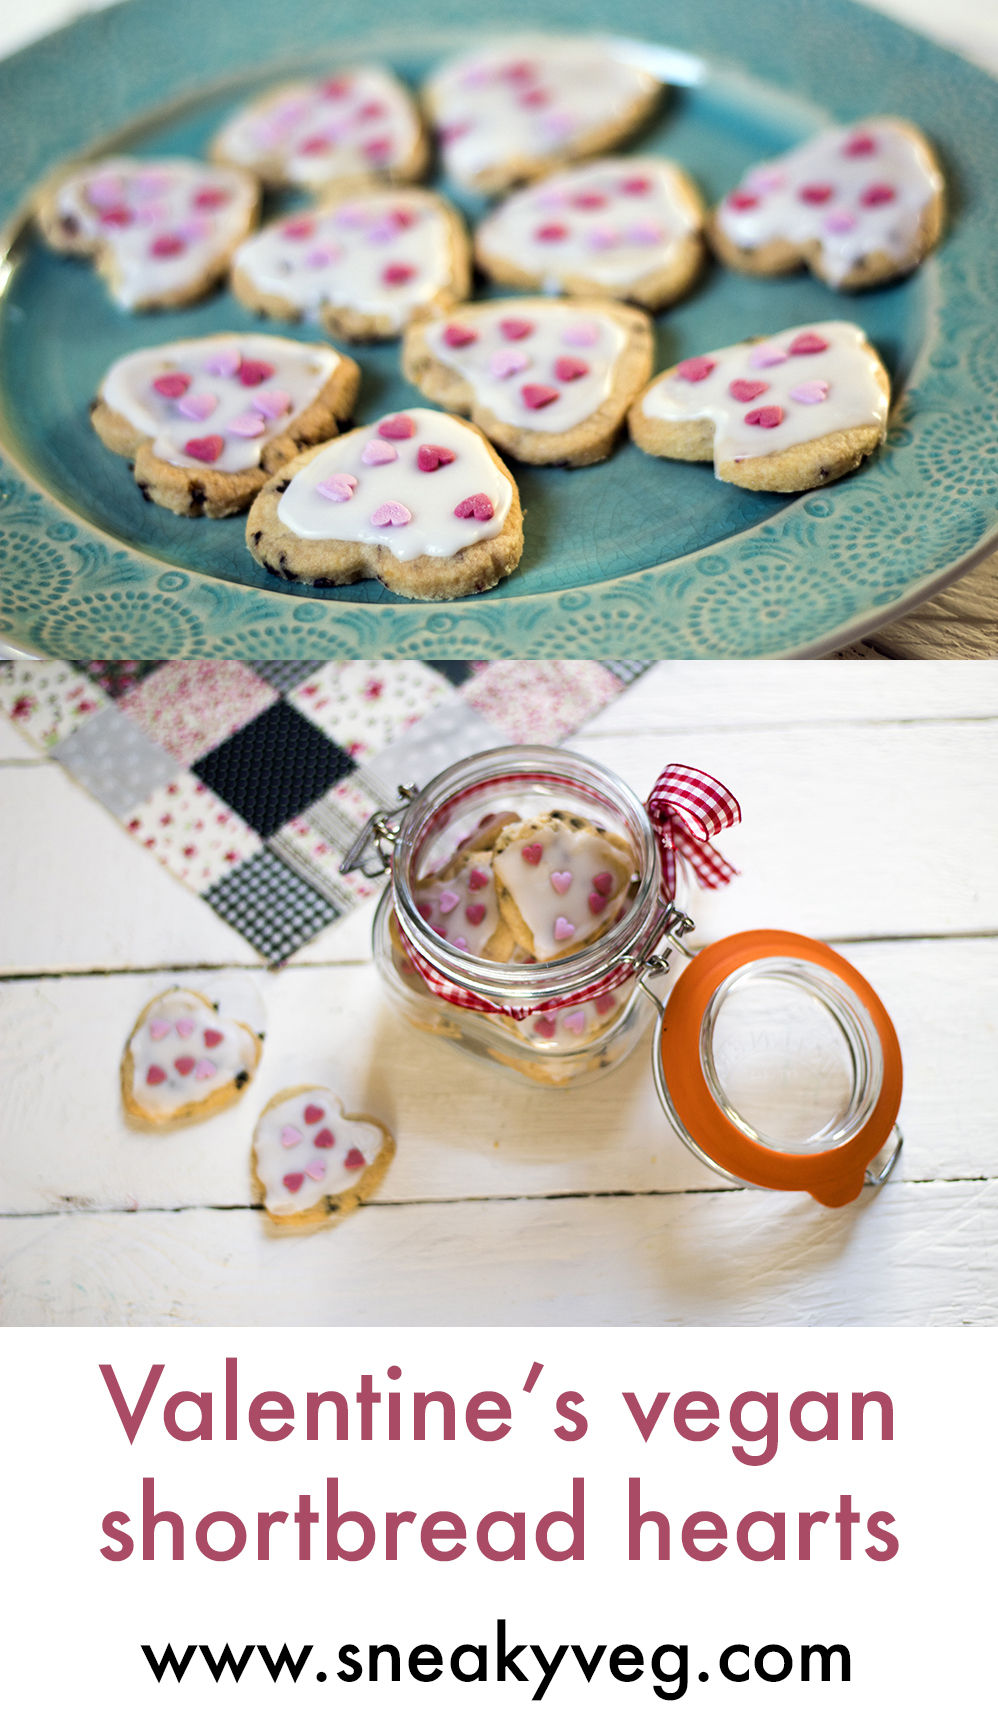 Vegan-shortbread-heart-biscuits-valentines-day